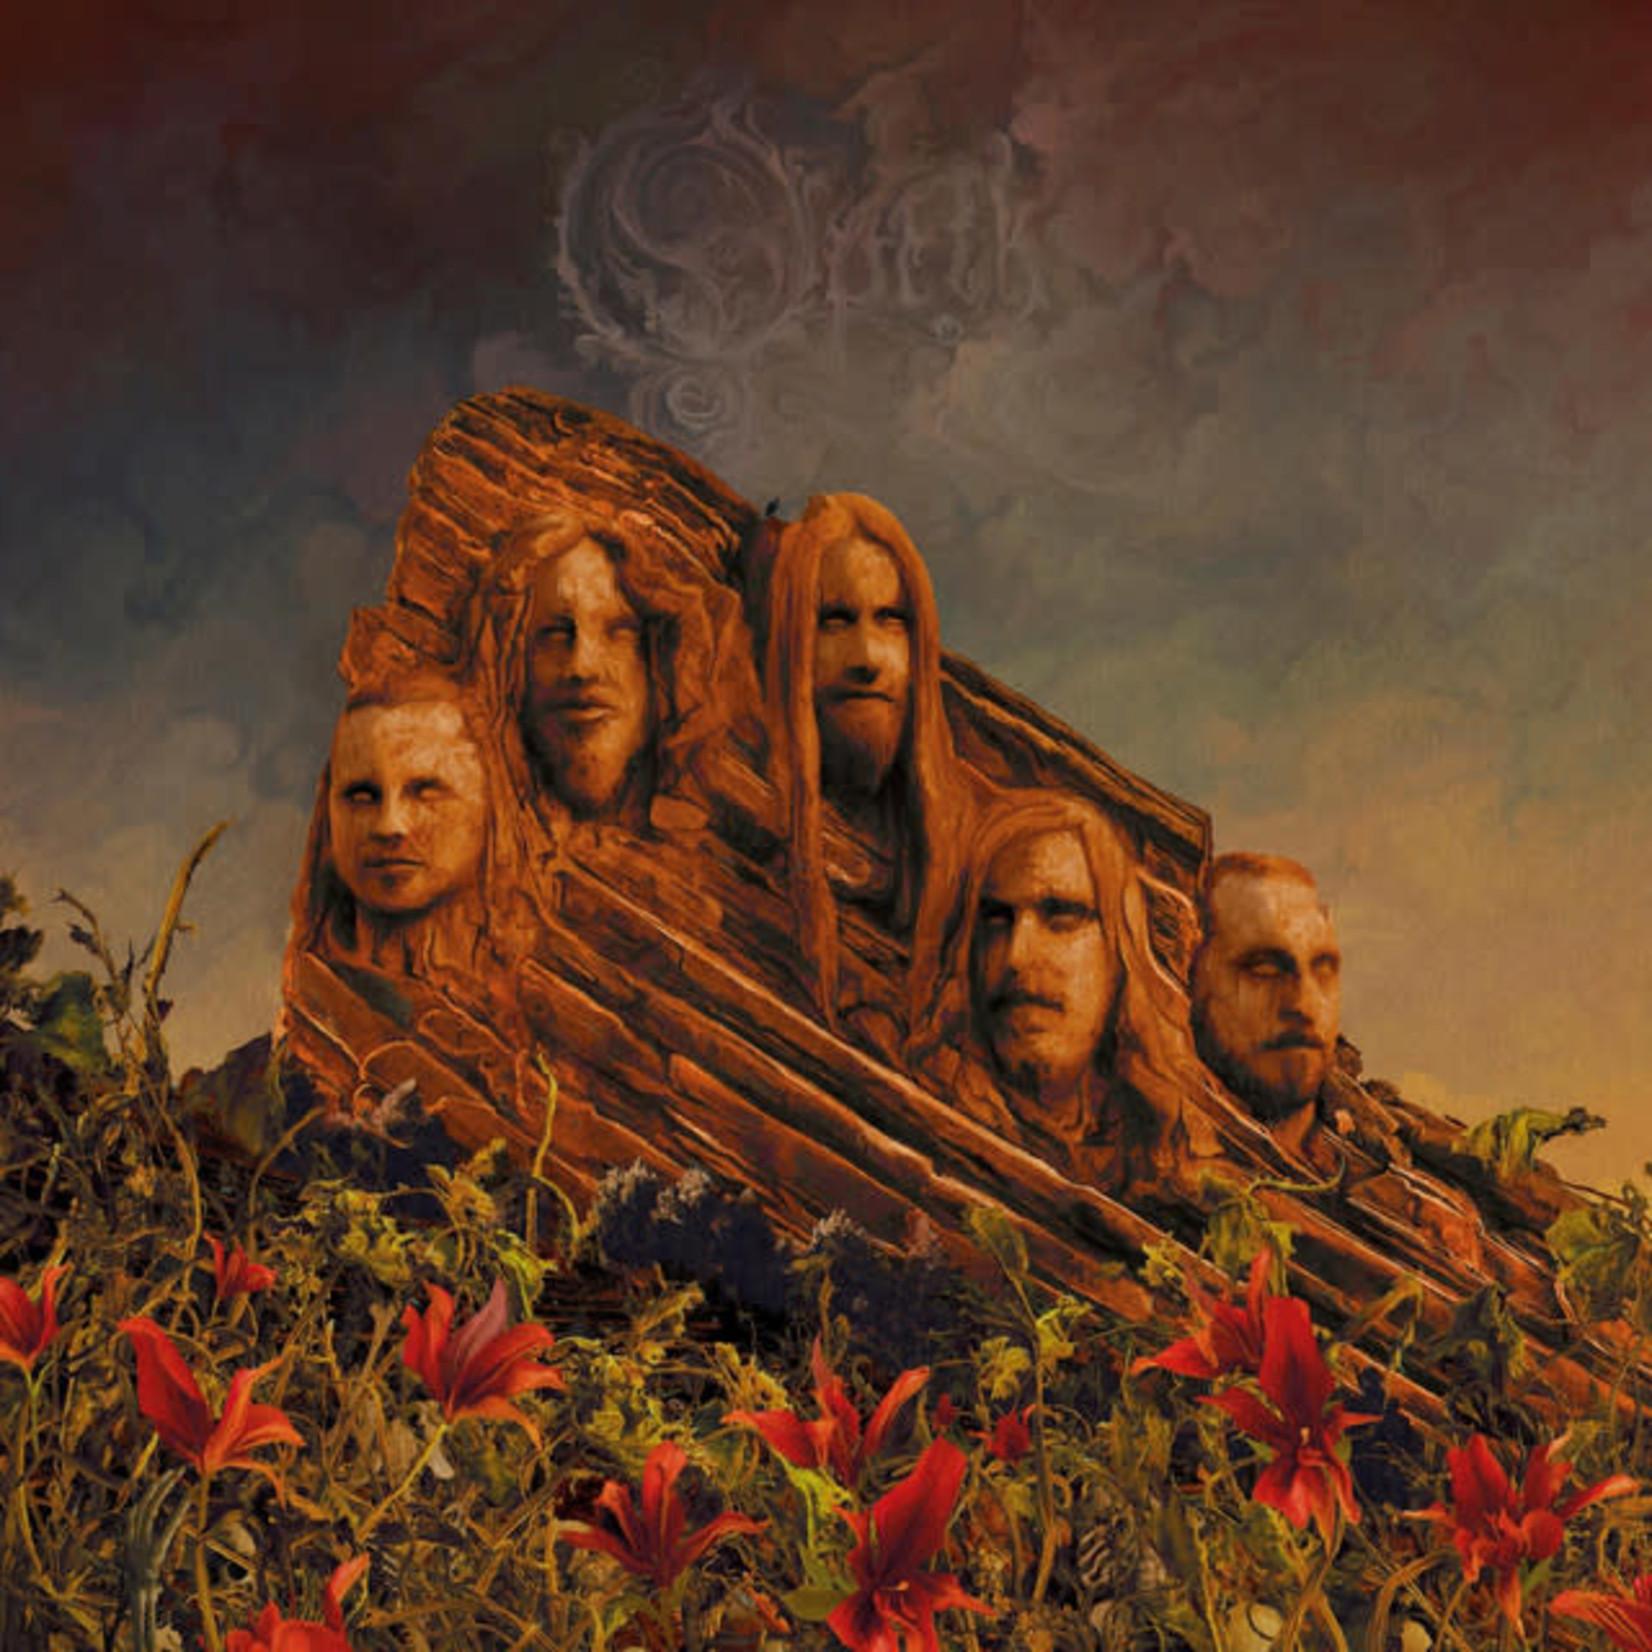 Vinyl Opeth - Garden Of Titans